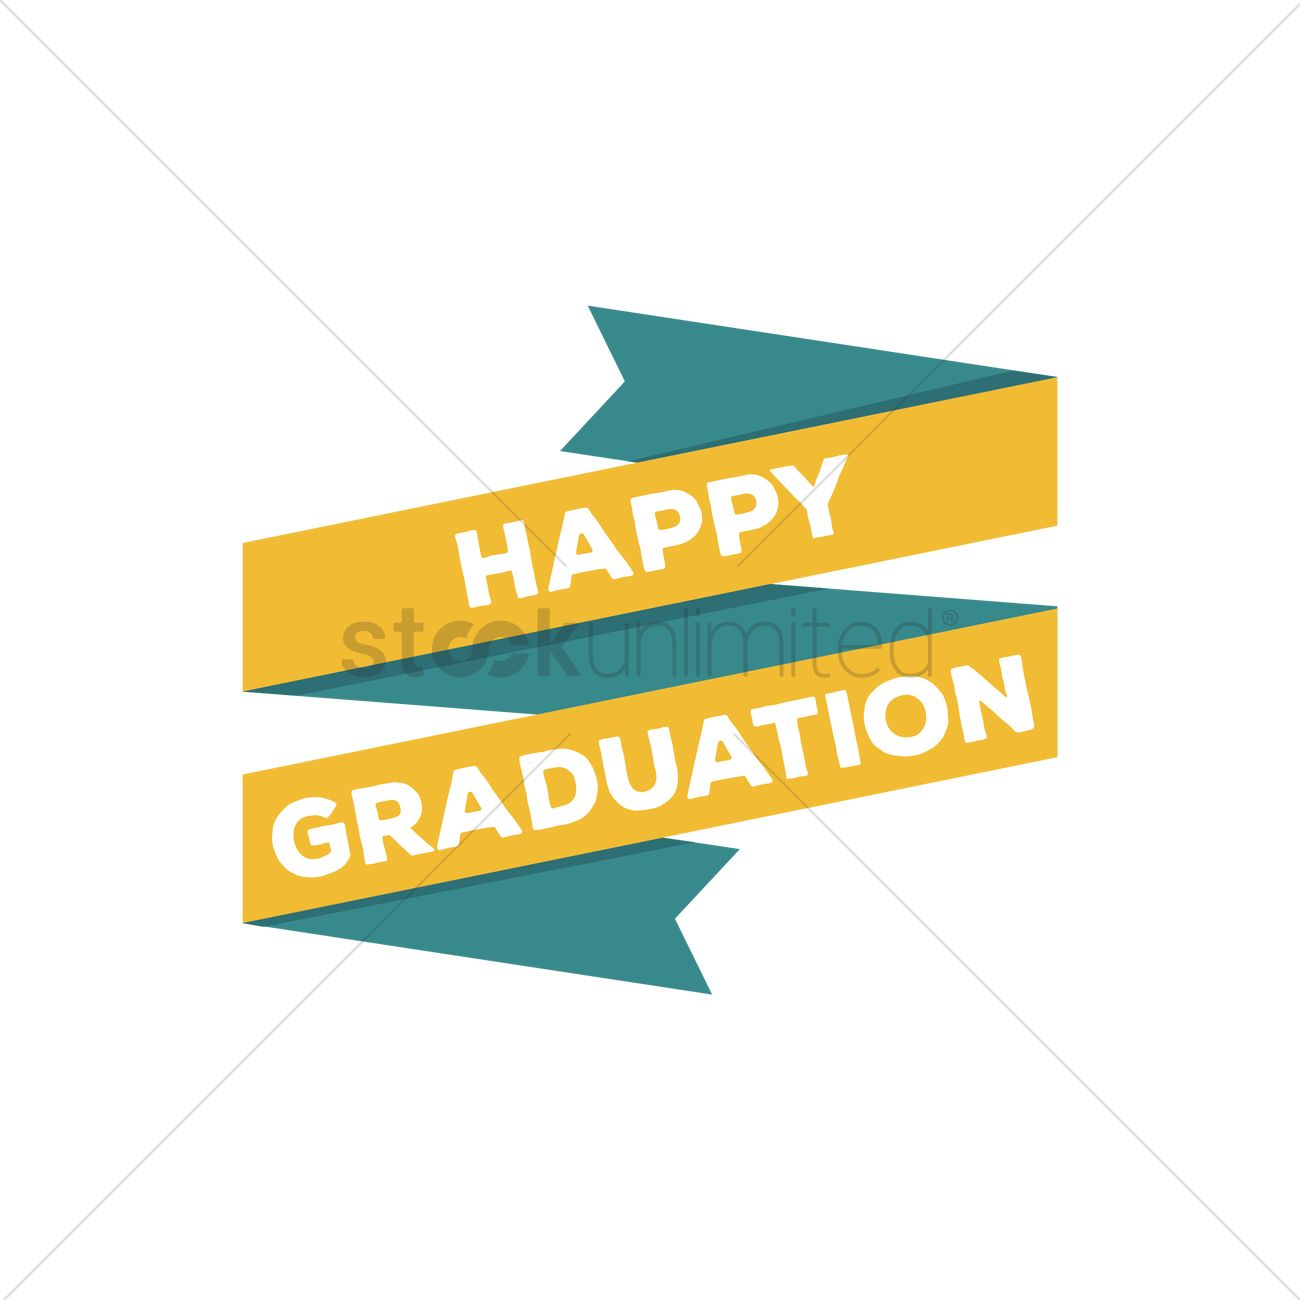 free happy graduation banner vector image 1514787 stockunlimited. Black Bedroom Furniture Sets. Home Design Ideas